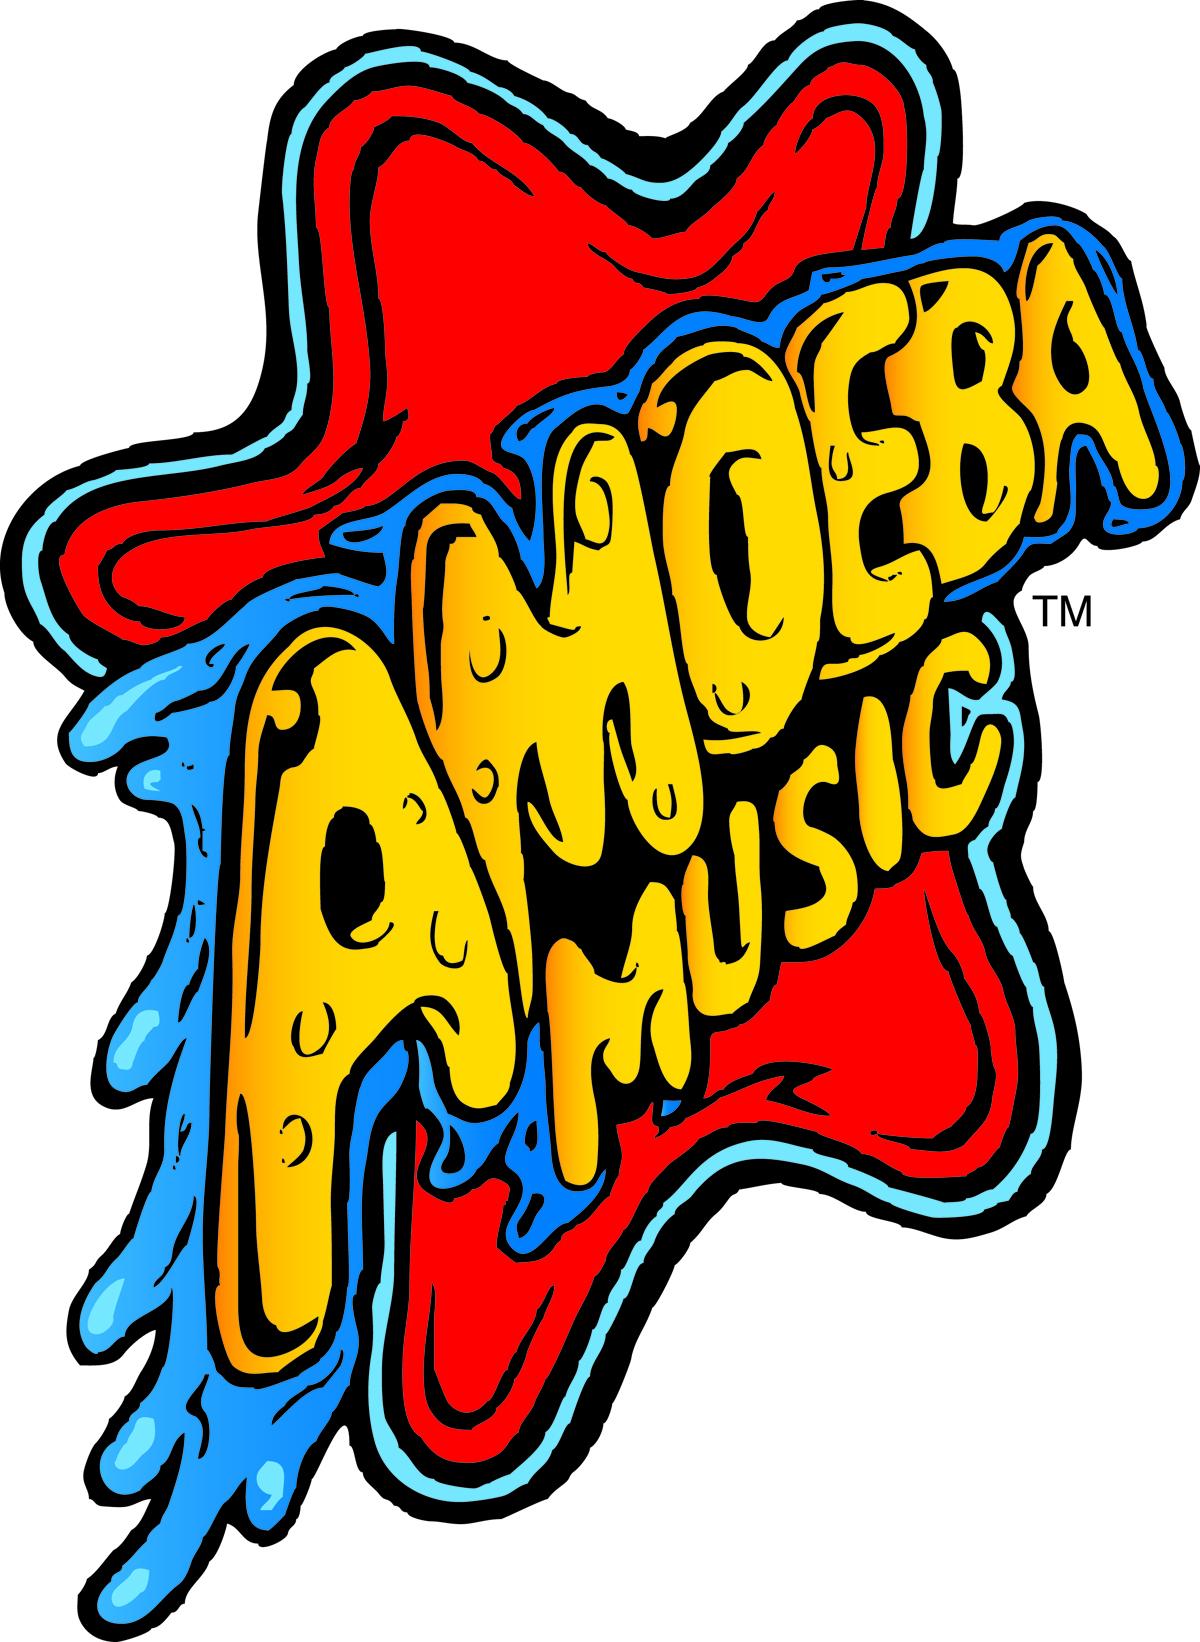 amoebalogoCMYKgraphic.jpg